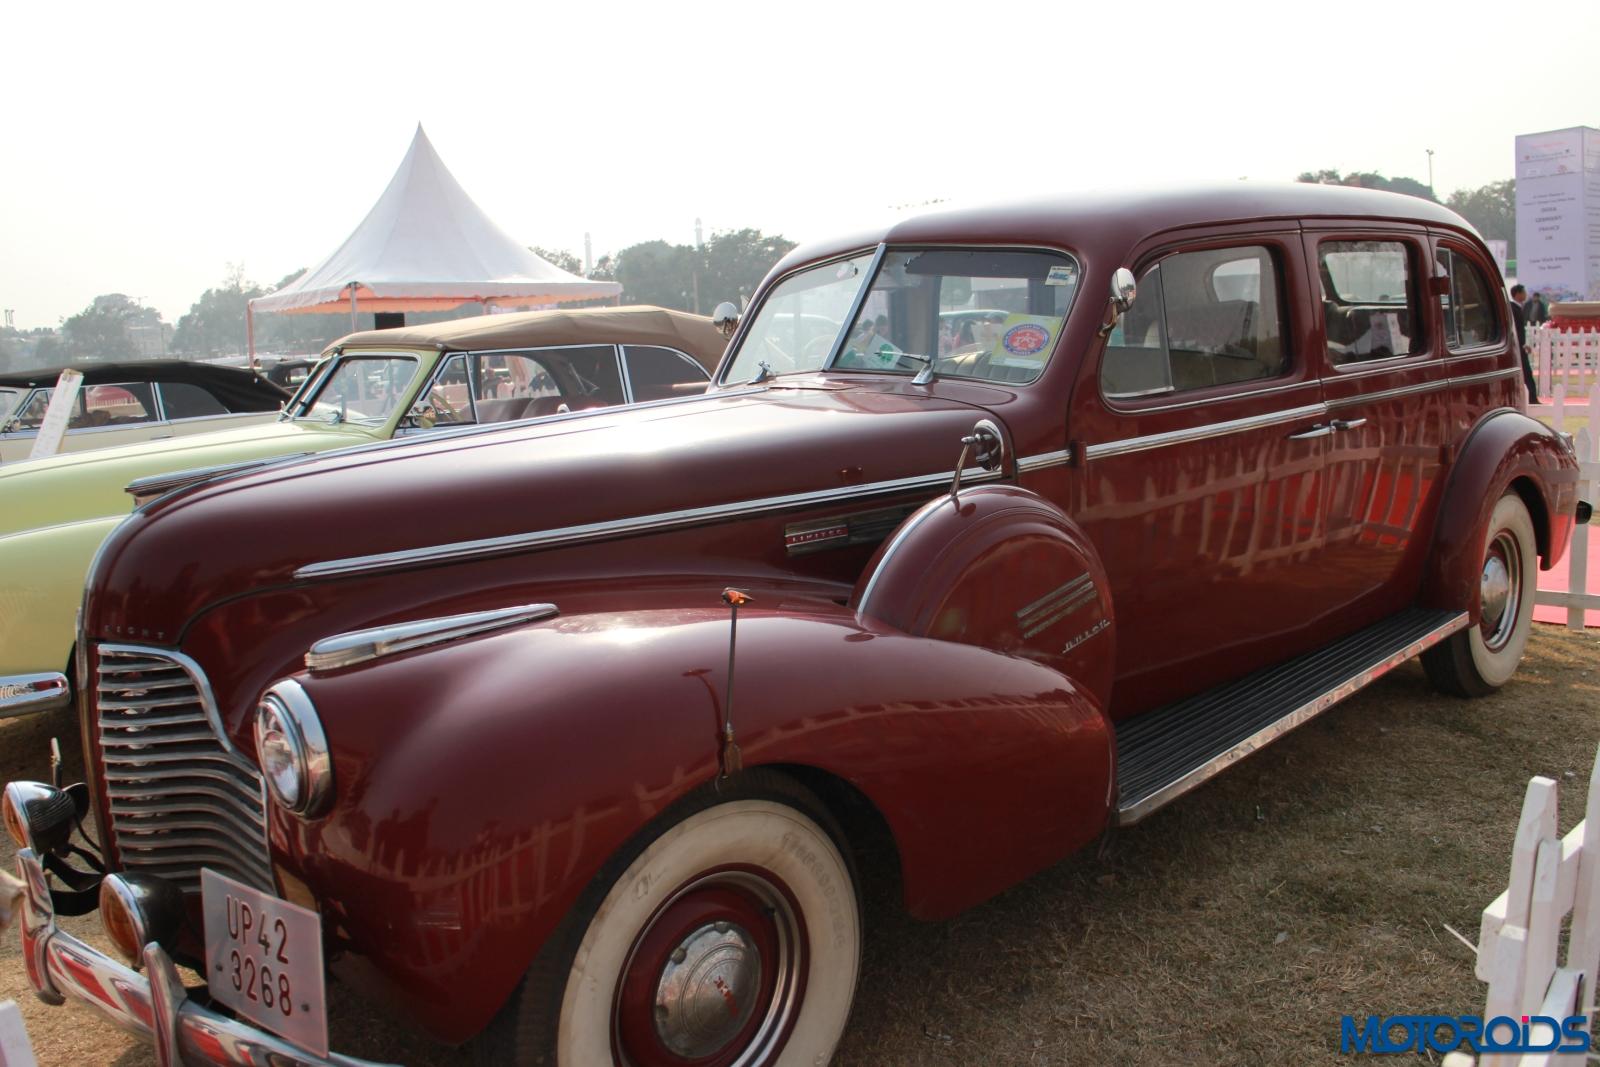 Mark Of Elegance Limo >> 21 Gun Salute International Vintage Car Rally 2016 revisited bygone era with class | Motoroids